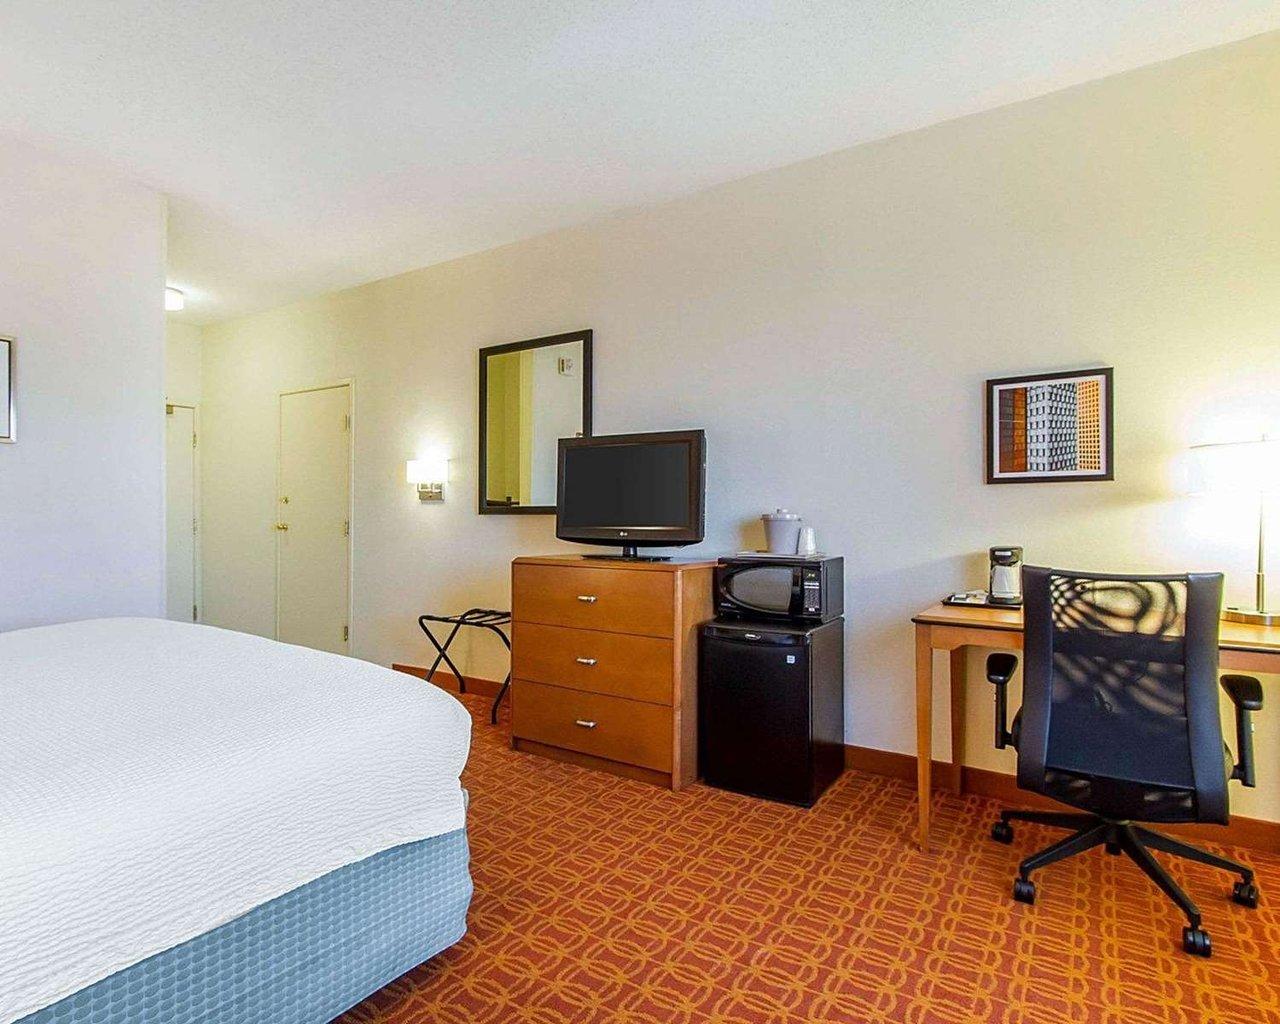 quality inn suites keokuk north updated 2019 prices hotel rh tripadvisor com